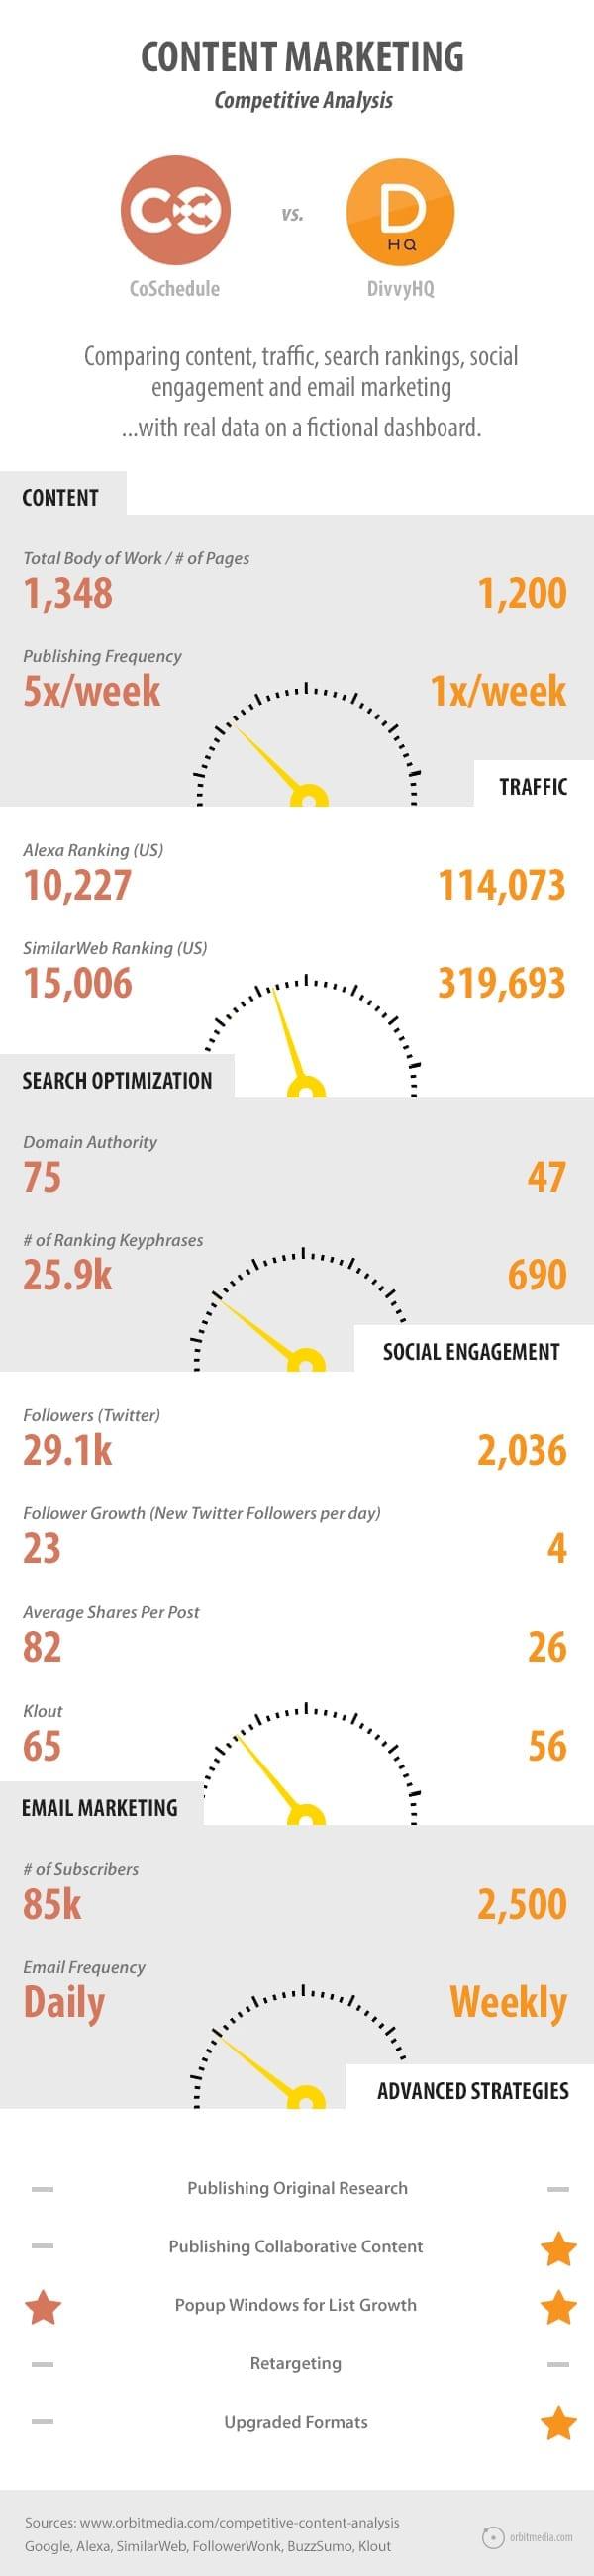 content-comparison-infographic (1)